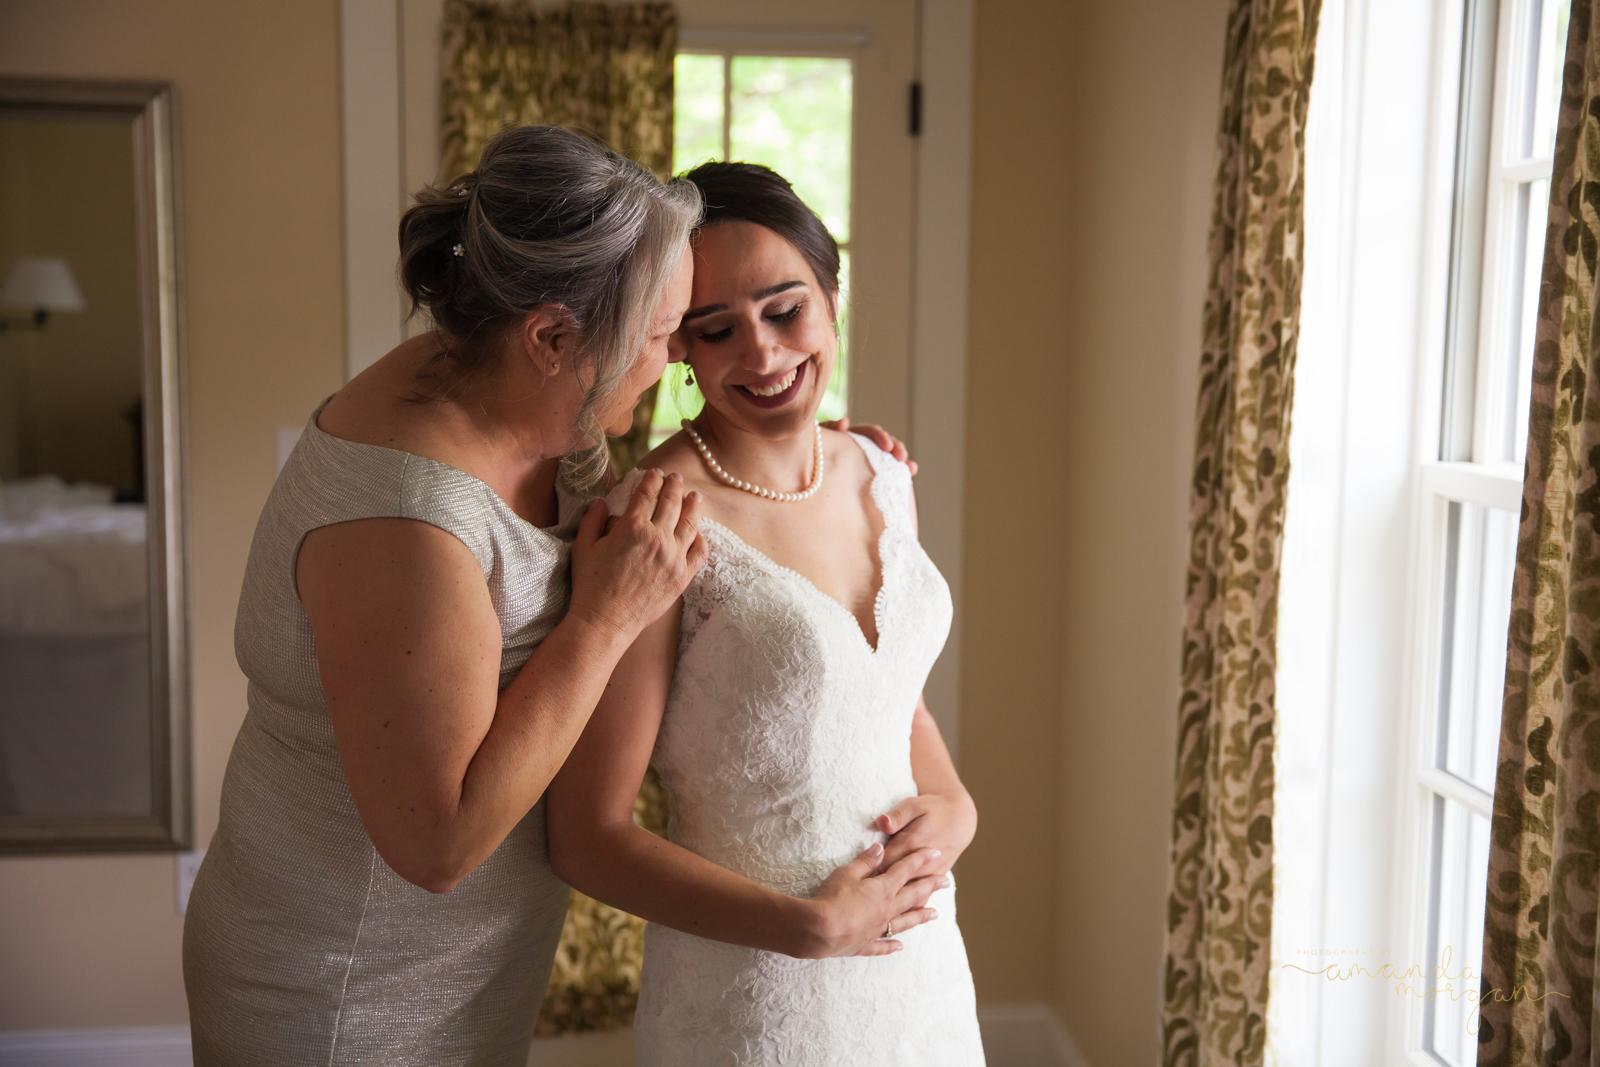 Publick-House-Wedding-Amanda-Morgan-13.jpg